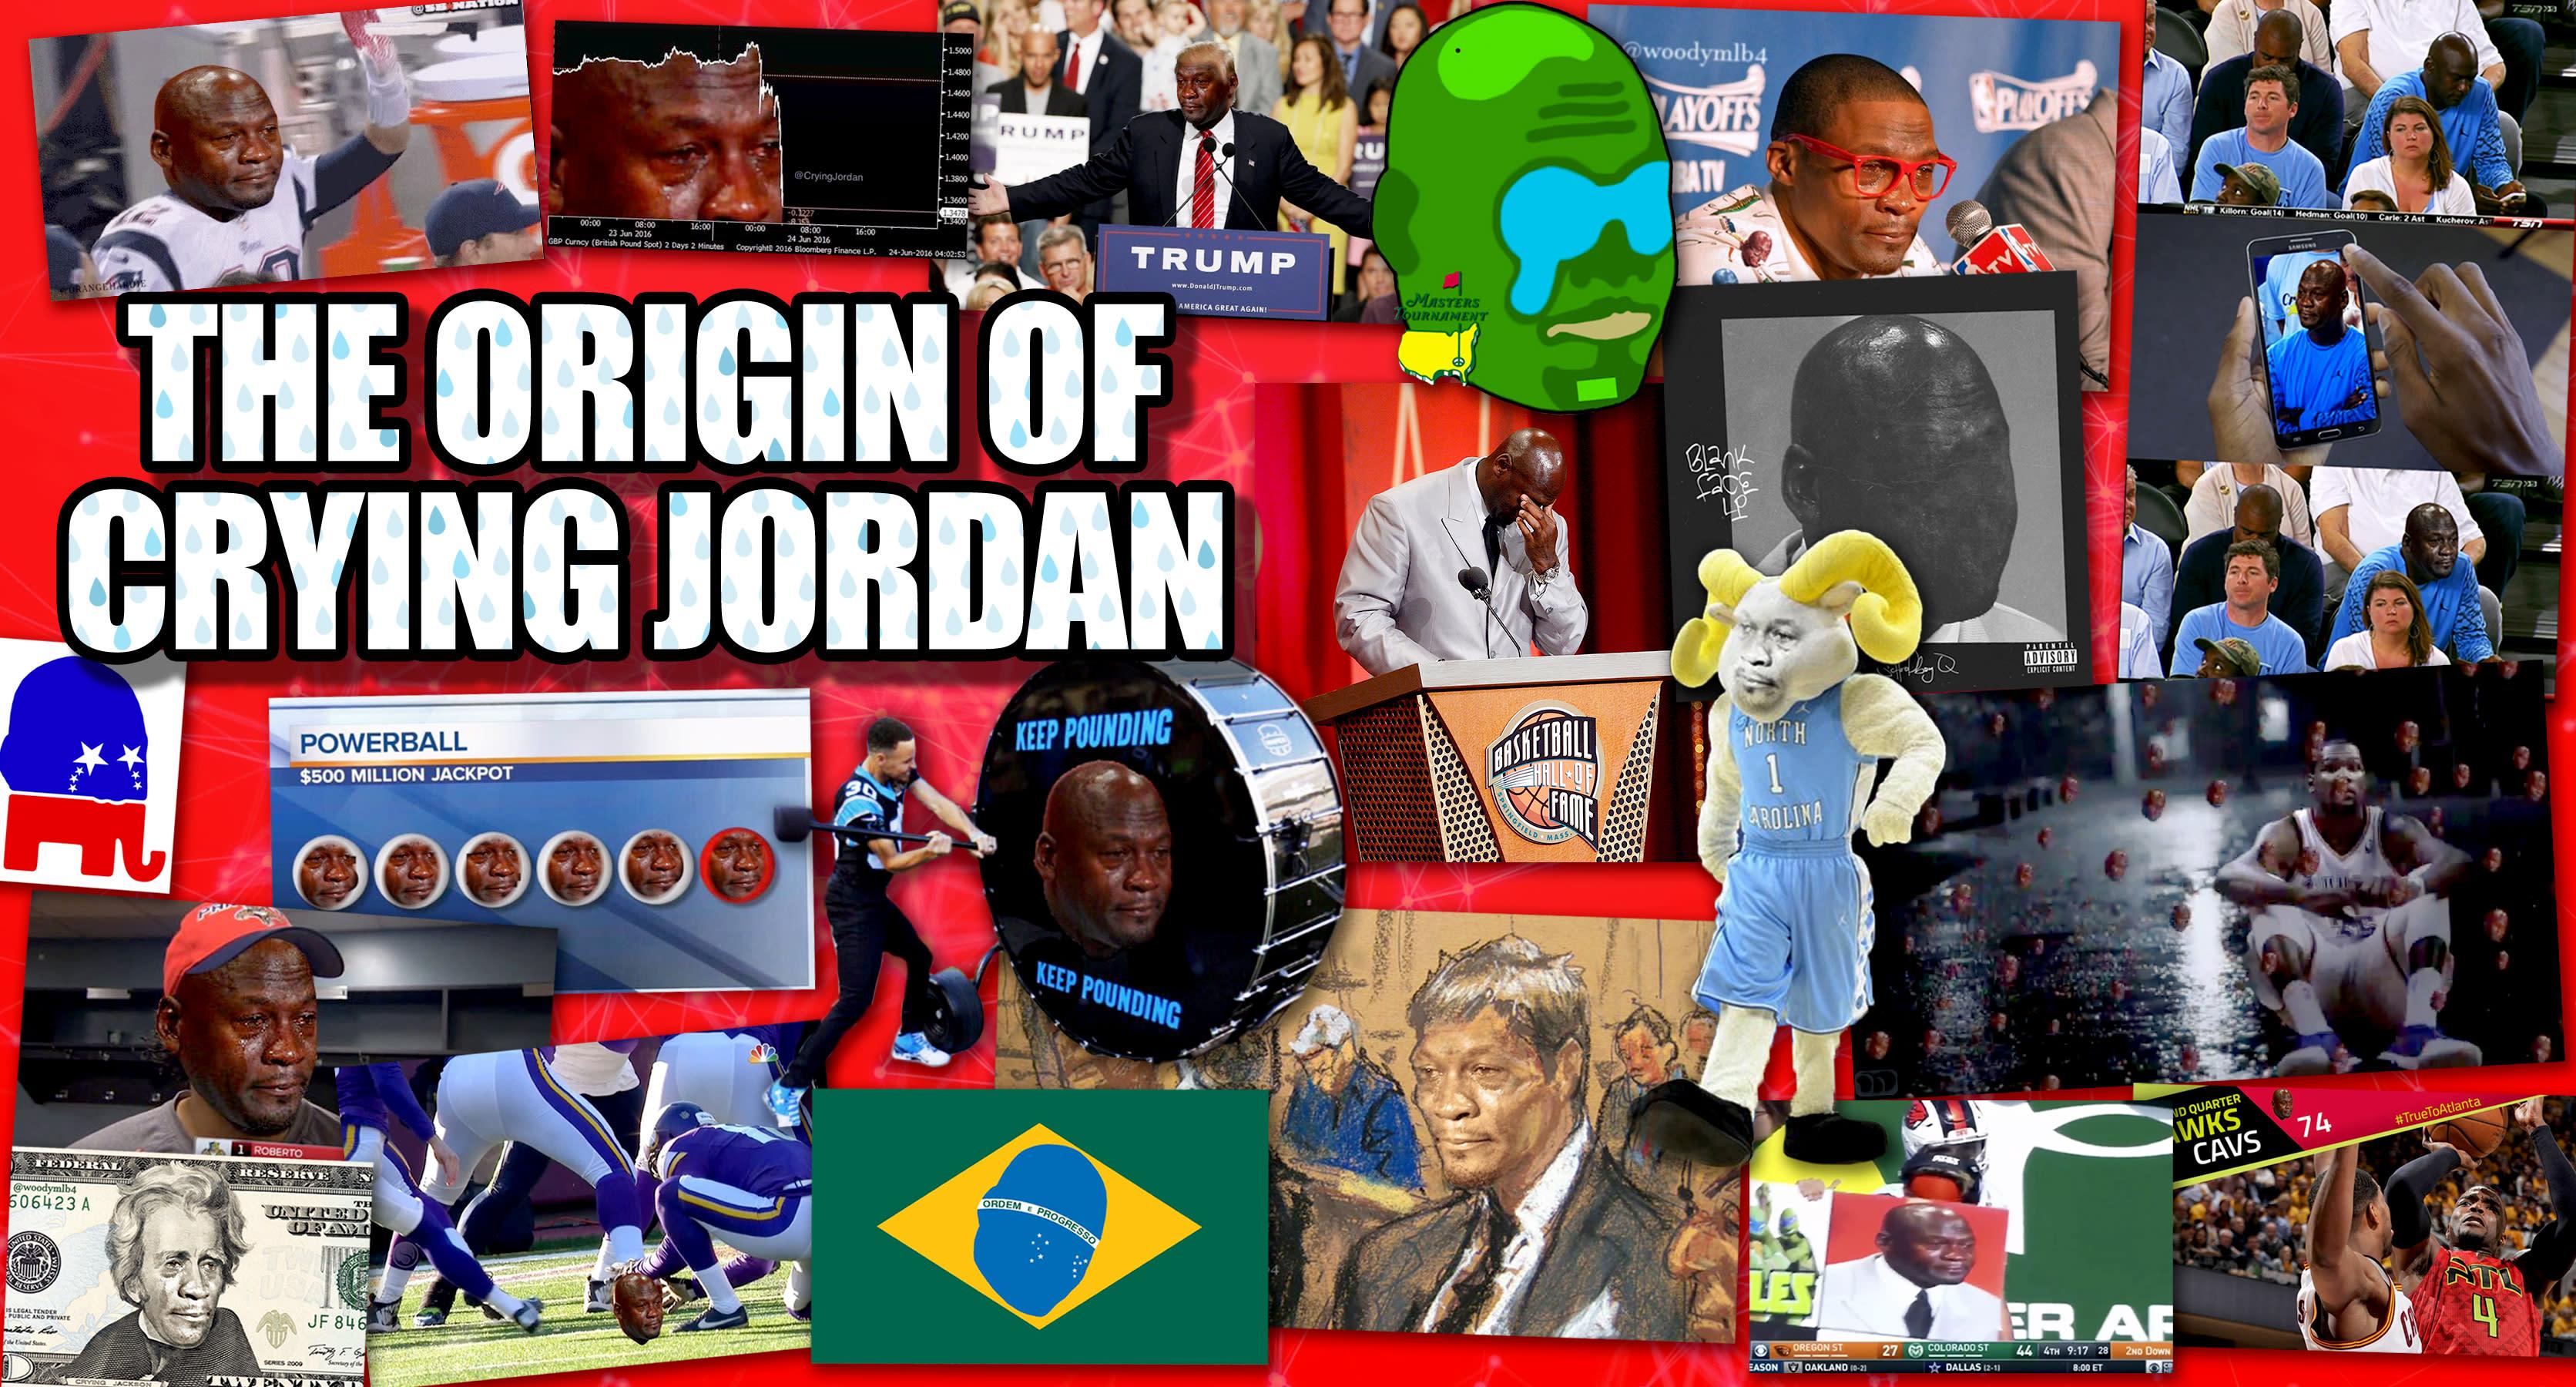 The Oral History Of Crying Jordan